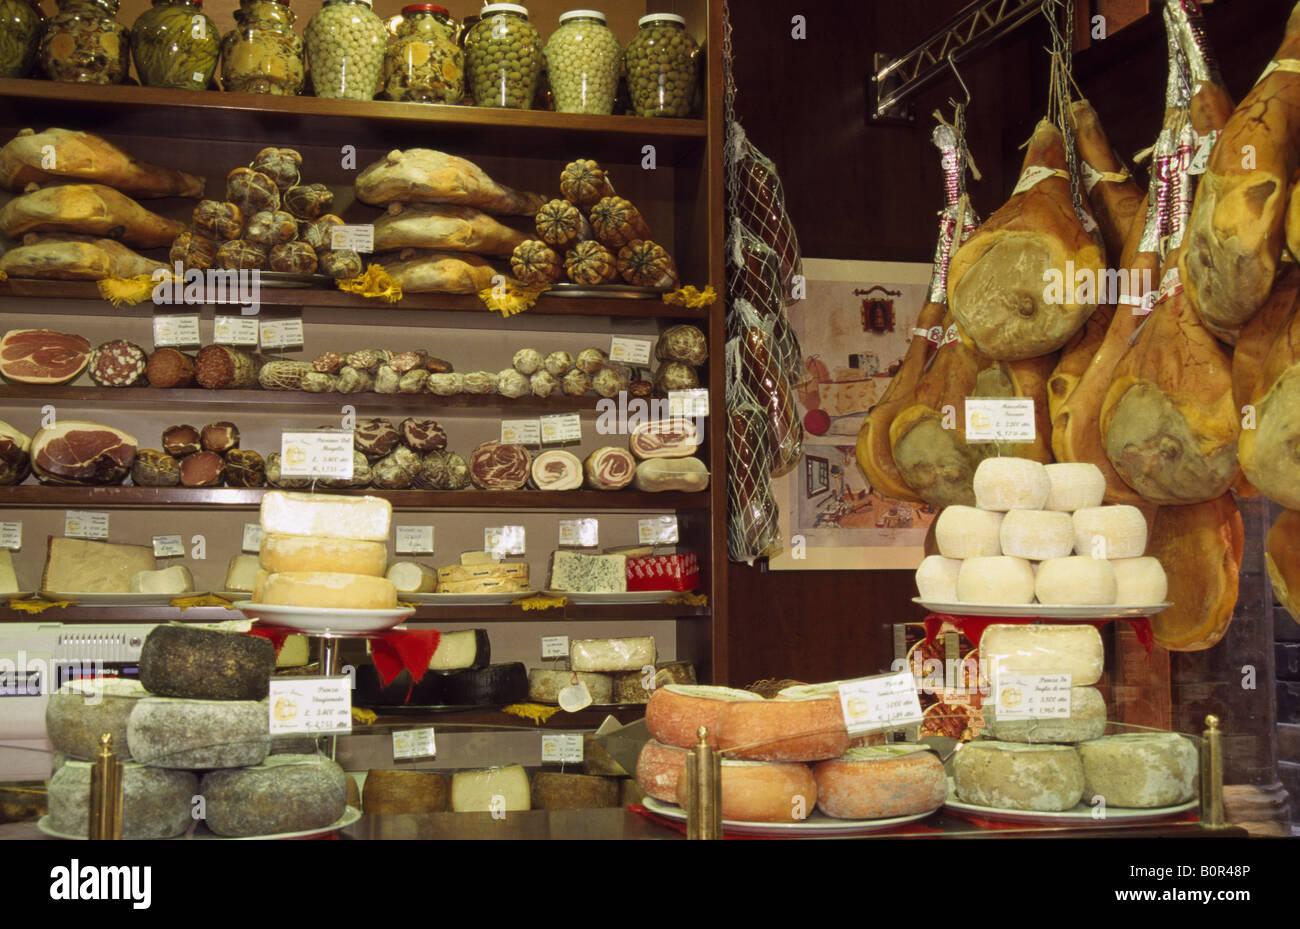 Delicatessen, Bologna, Italy - Stock Image